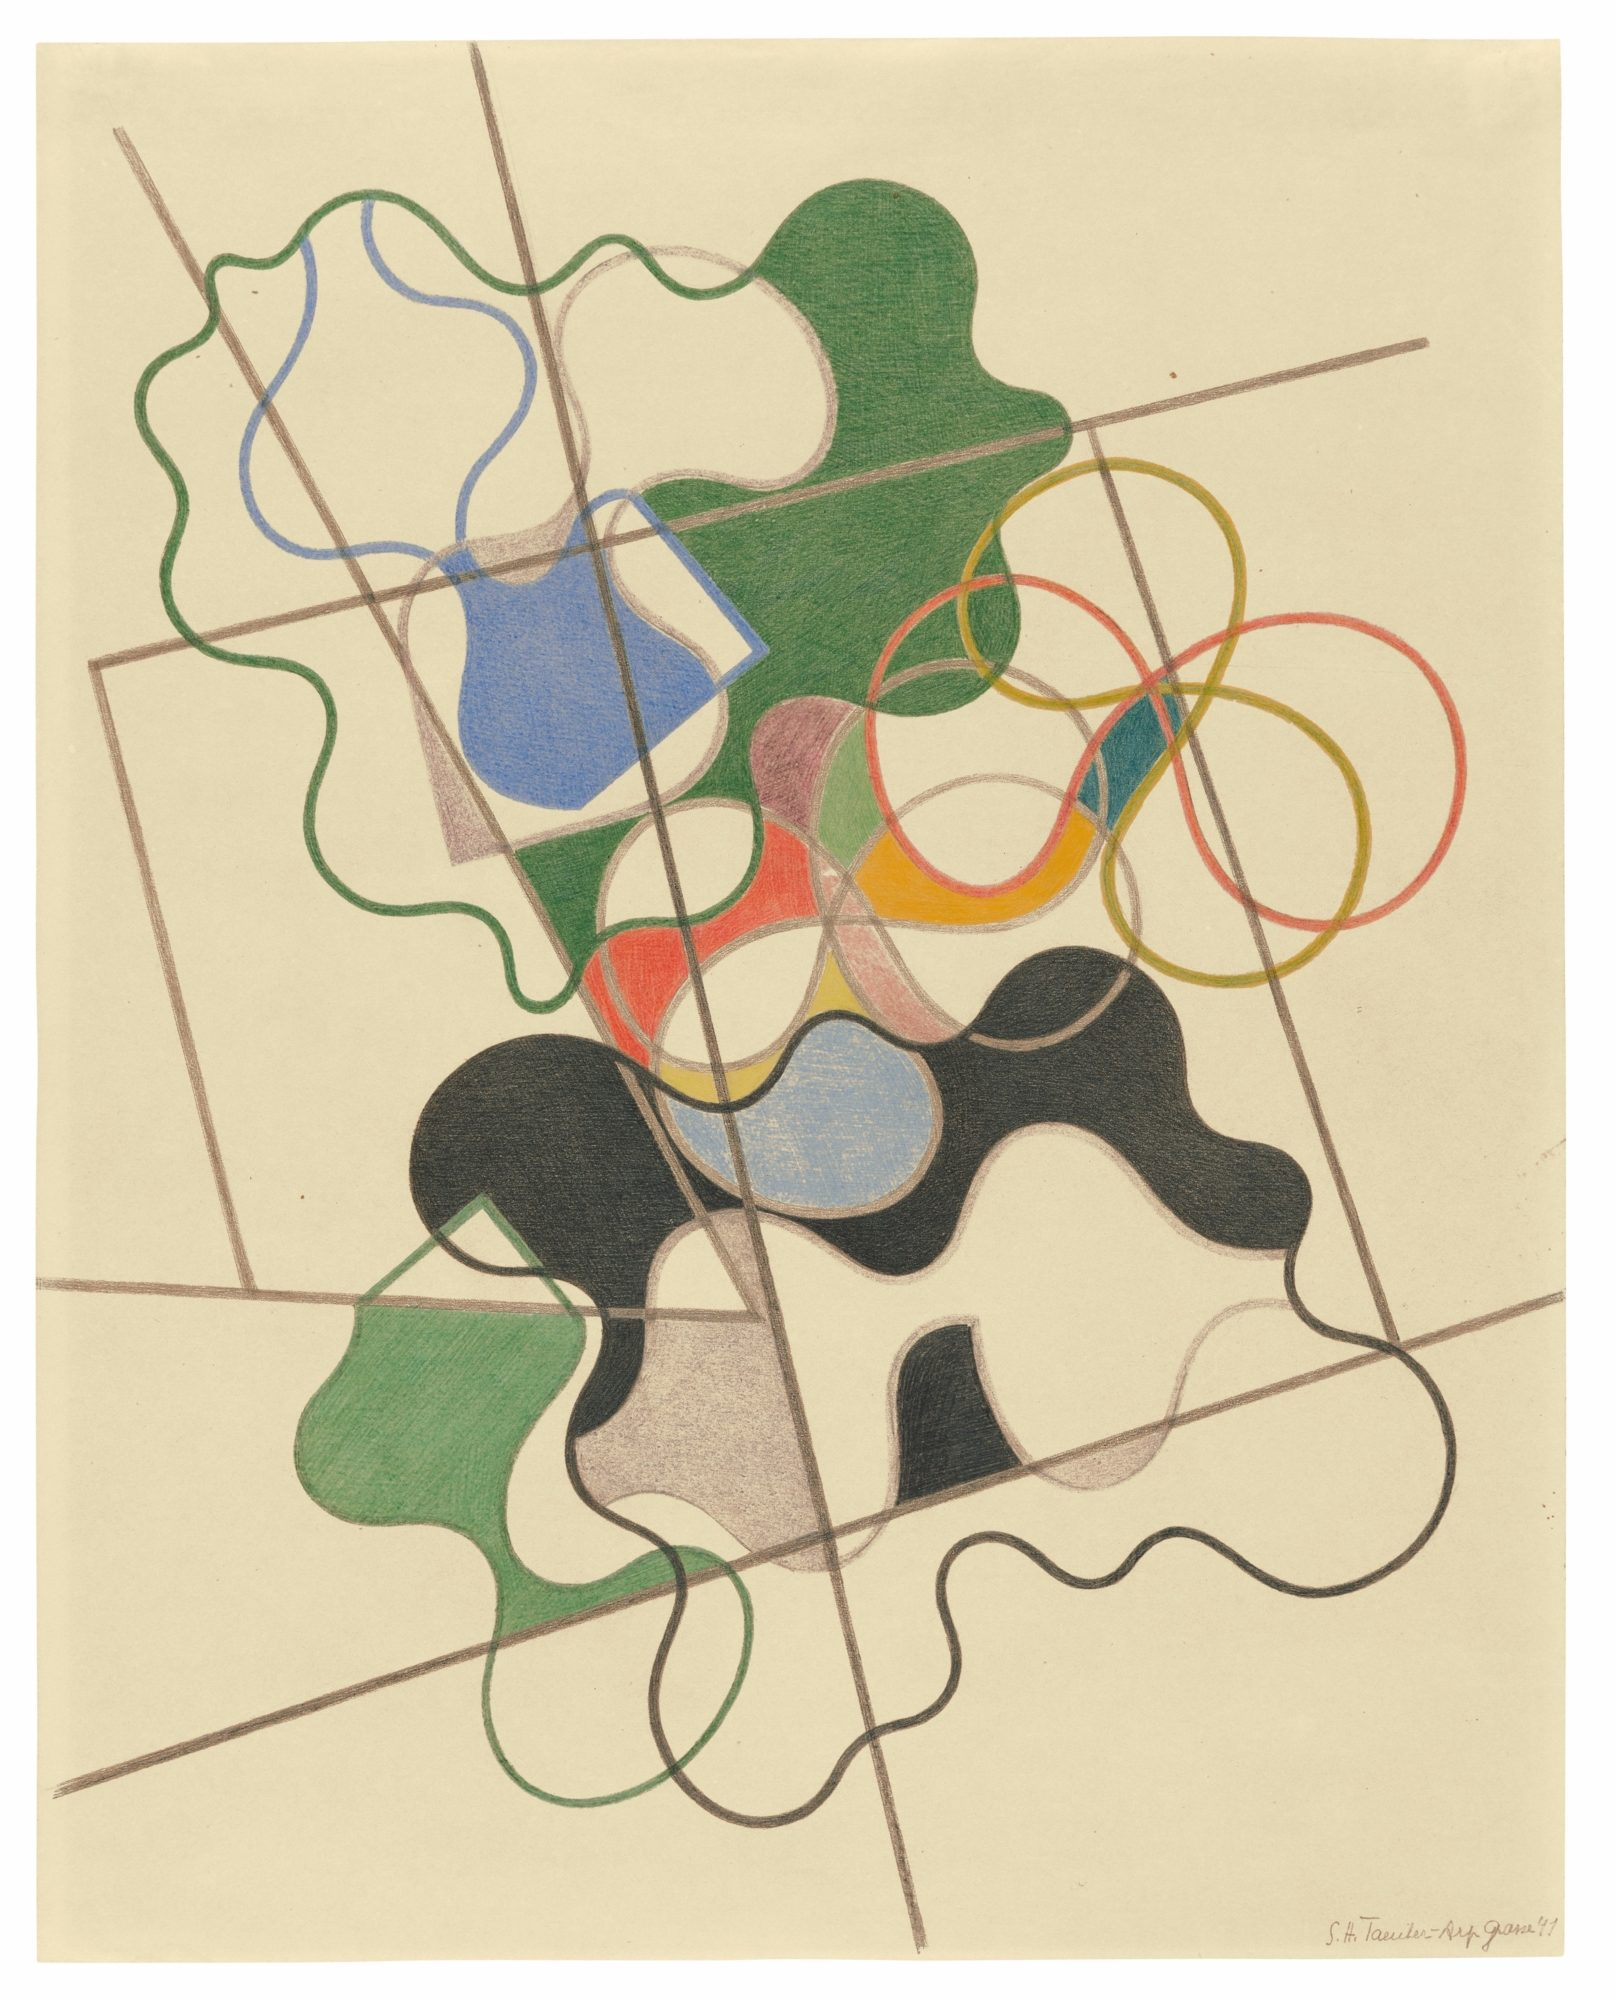 <h2>Tate Modern</h2>'s Work